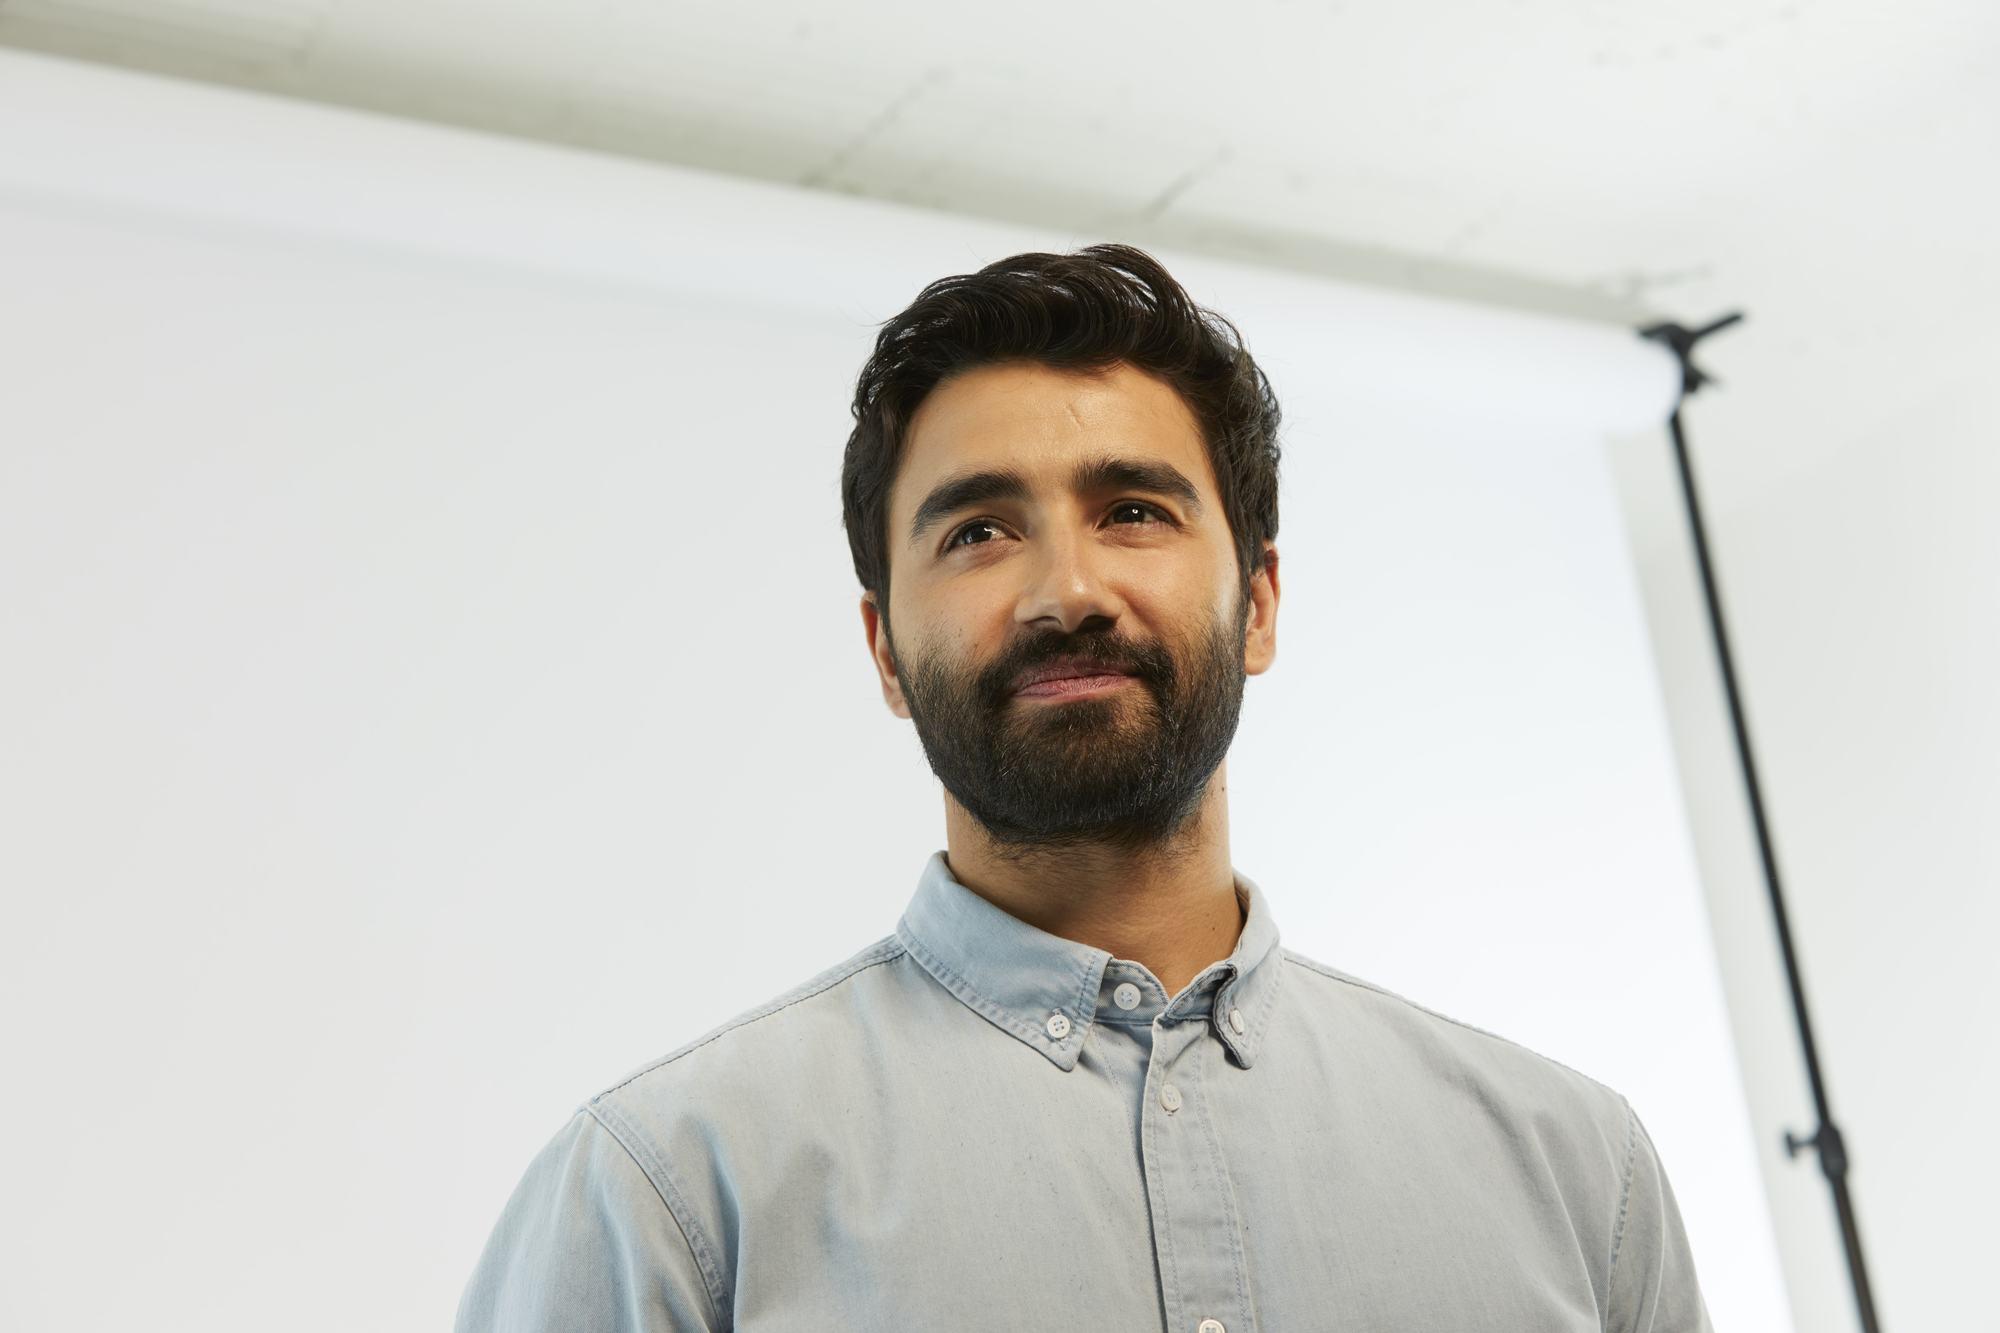 Beard Grooming Tips: 8 Ways To Maintain A Brilliant Beard